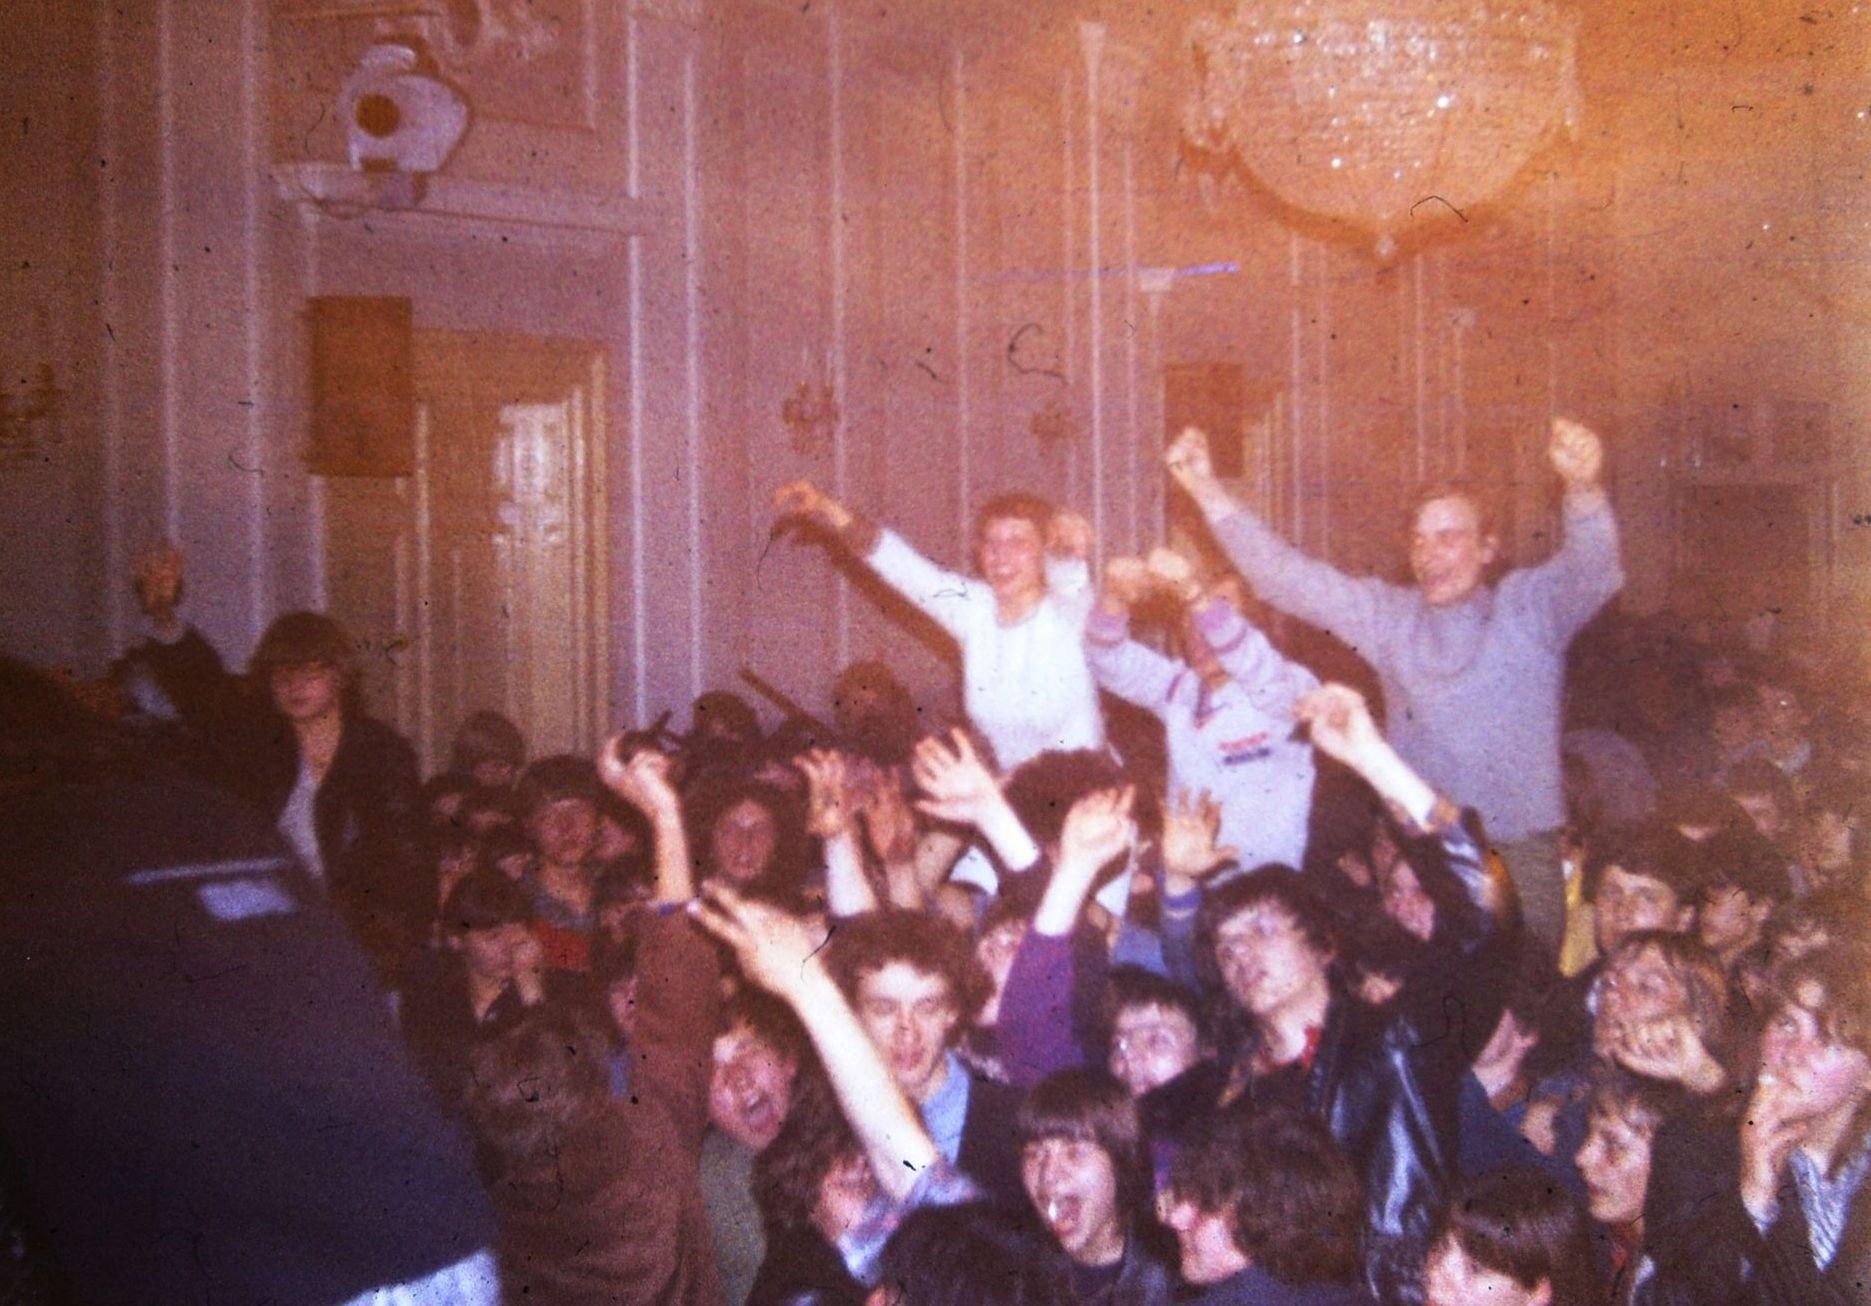 1979_peron_koncert_muvhaz.jpg